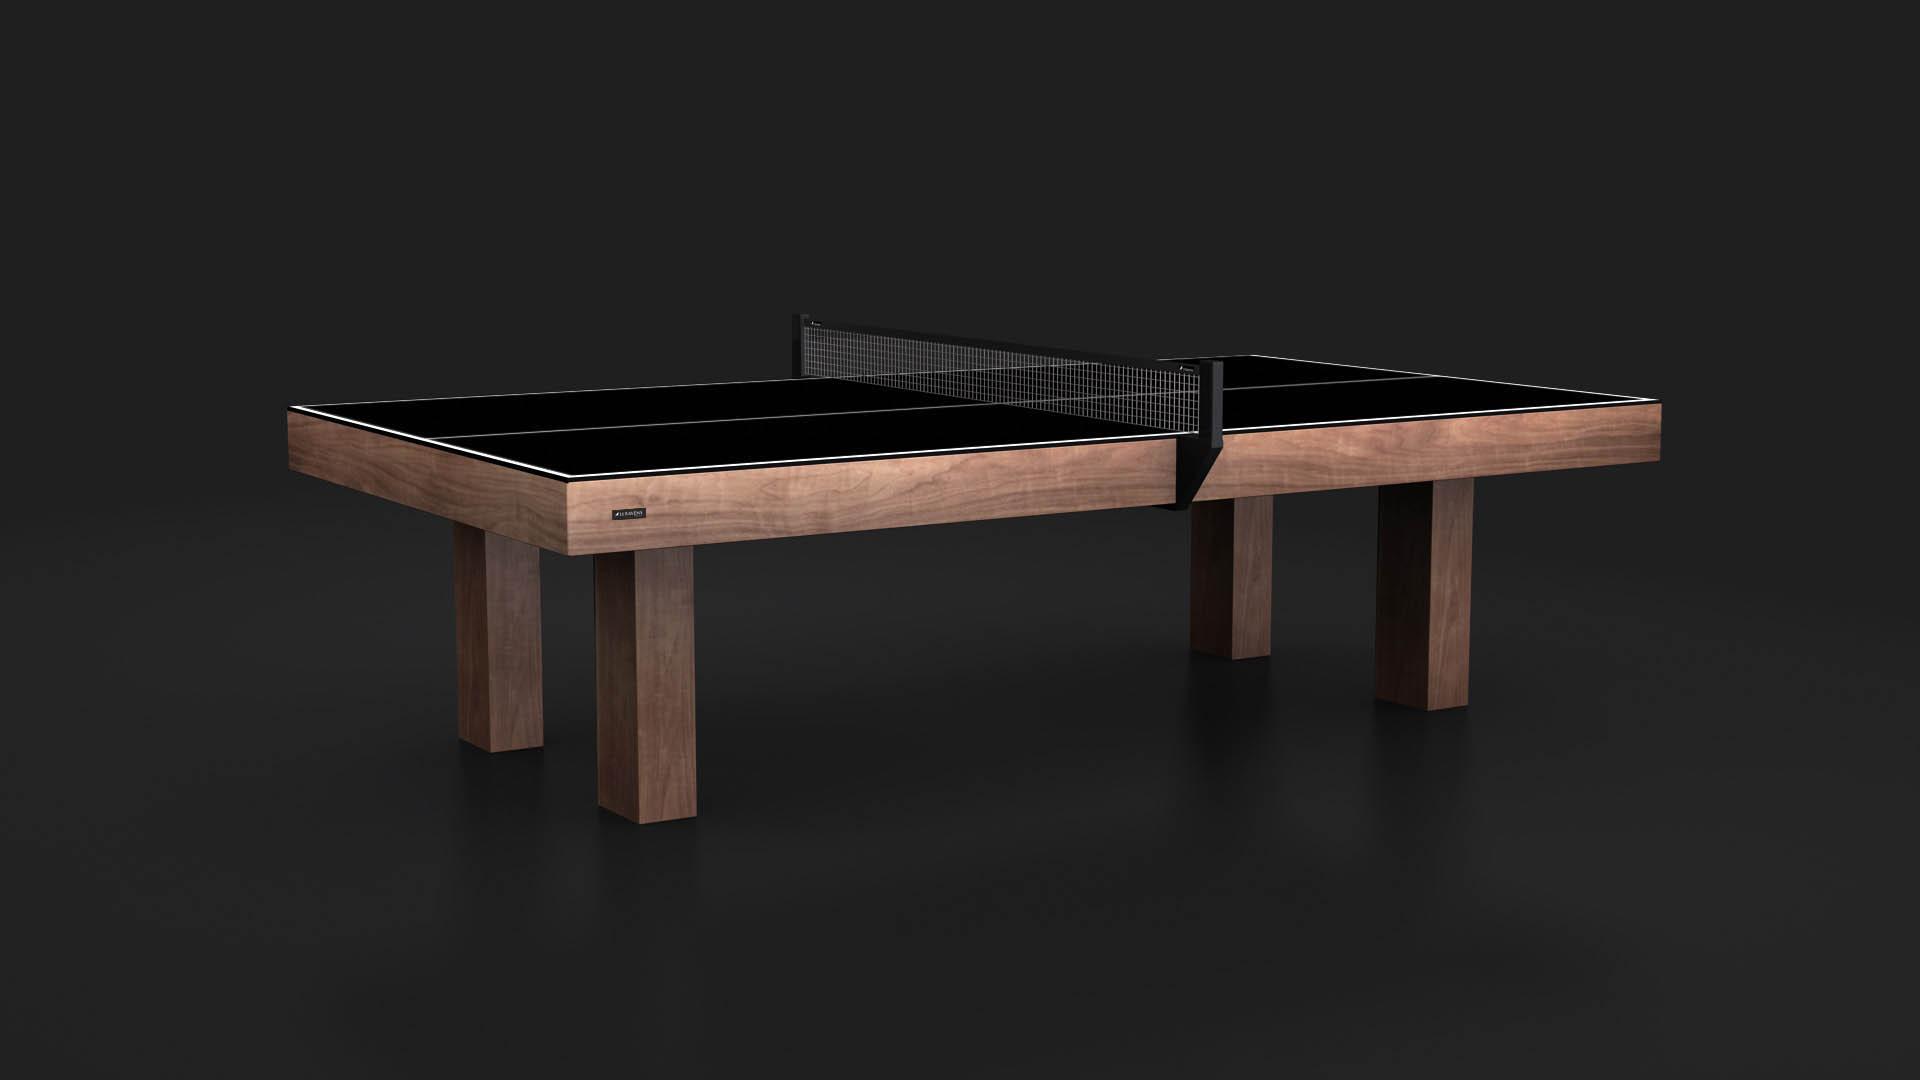 Malibu Table Tennis